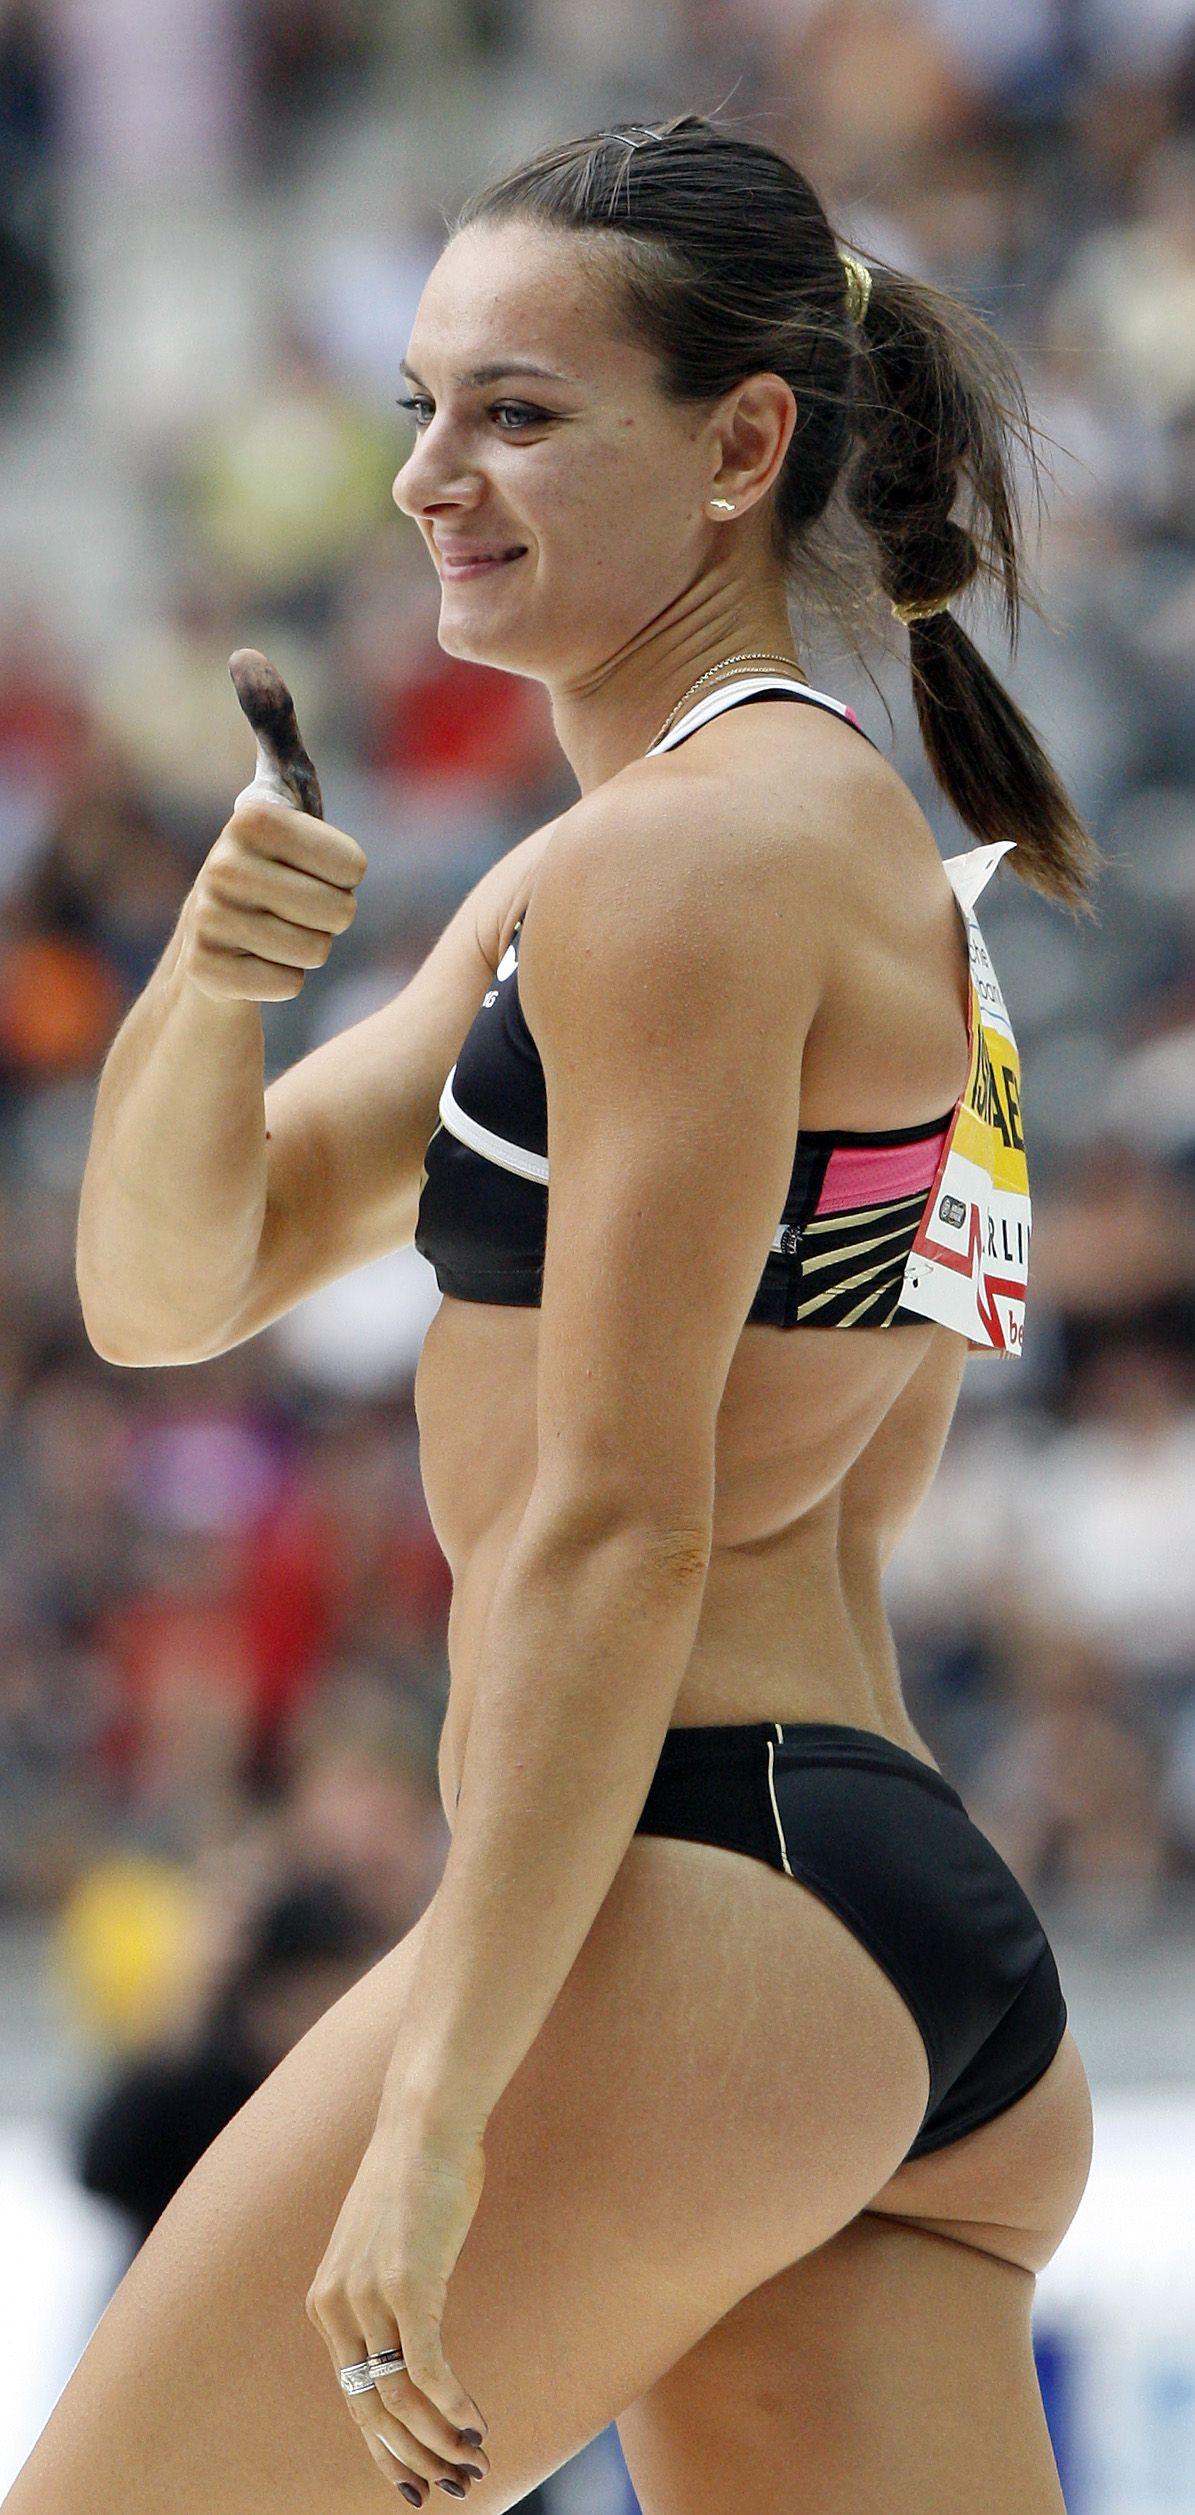 Youtube Russian Woman Pole Vaulter 16